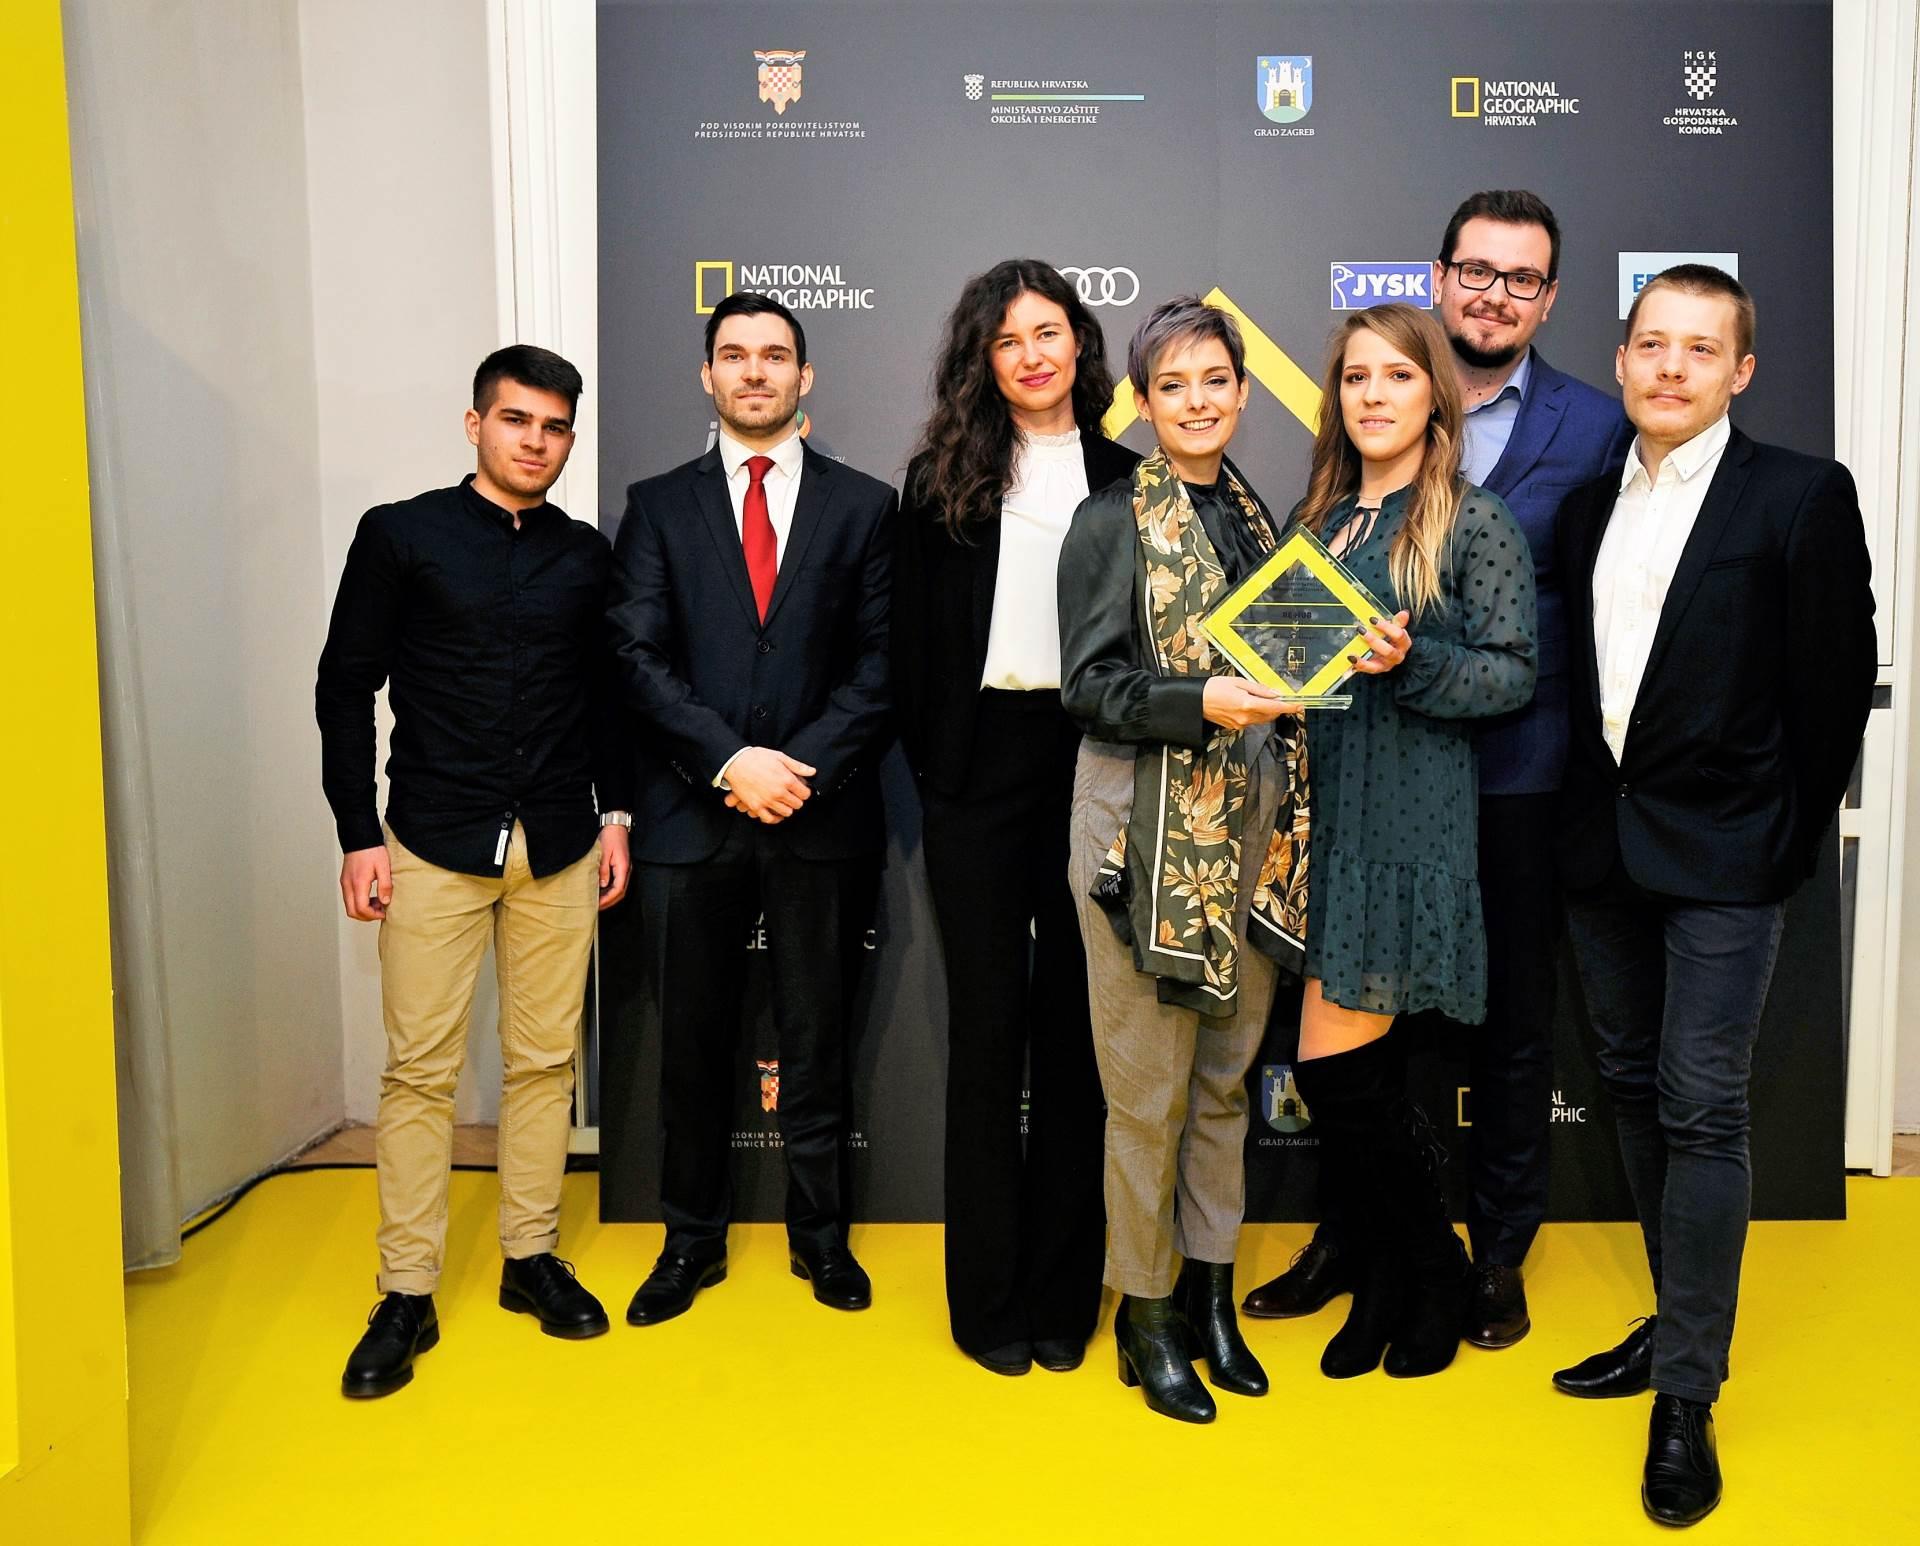 RE HUB Antun Čošković, Dominik Kruhak, Martina Martić, Leila Nanuk, Ivona Matković,Ivan Dajak, Borna Žganec